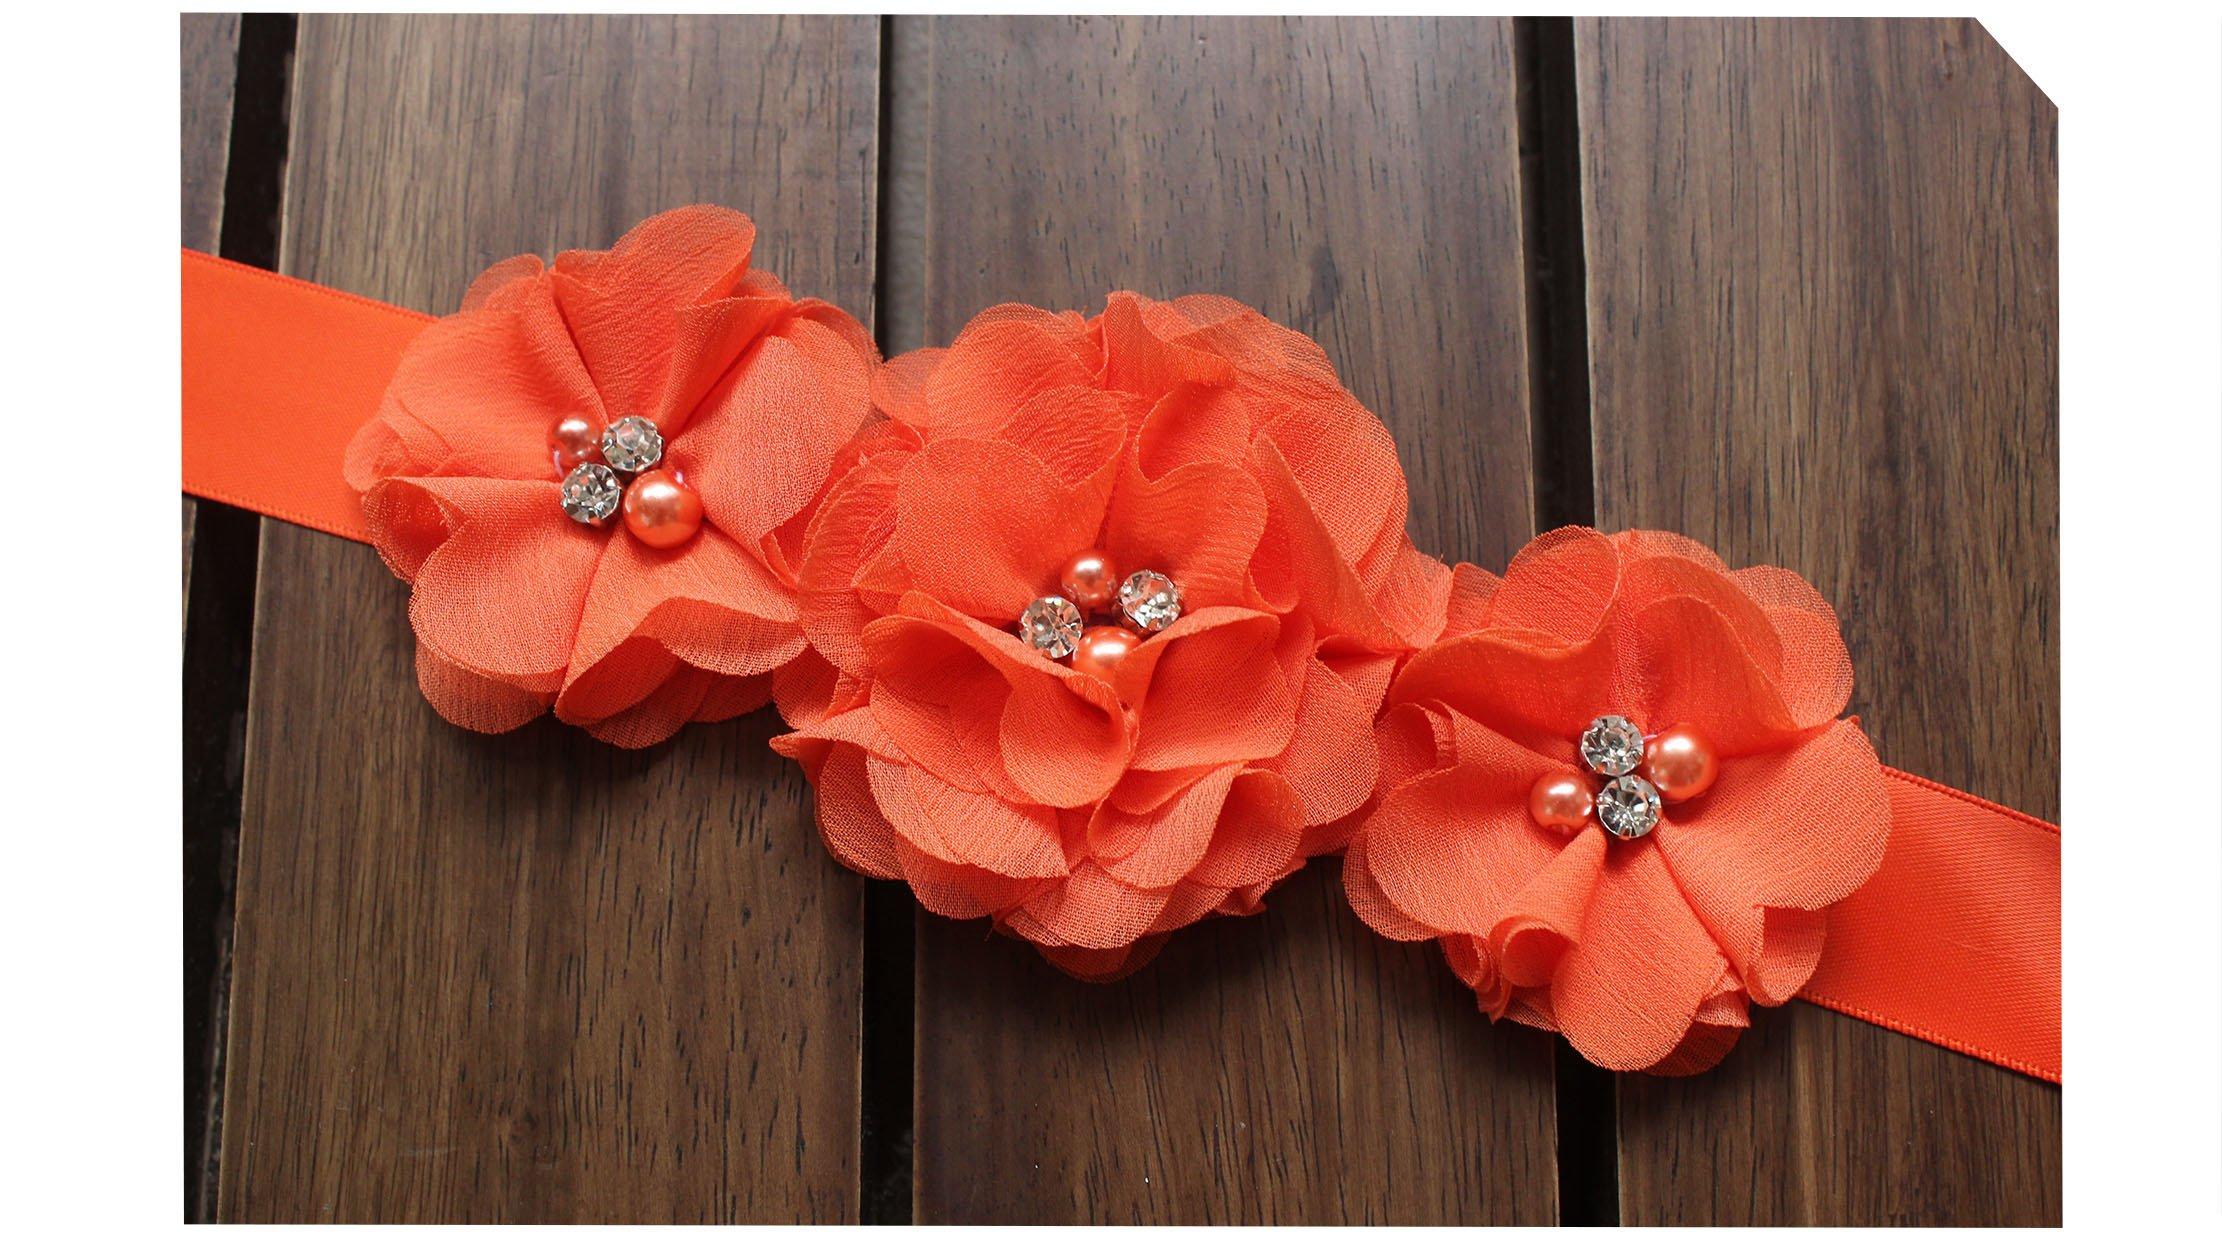 Bridesmaid and Flowergirls sashes wedding sash pearls flowers belts (Orange)